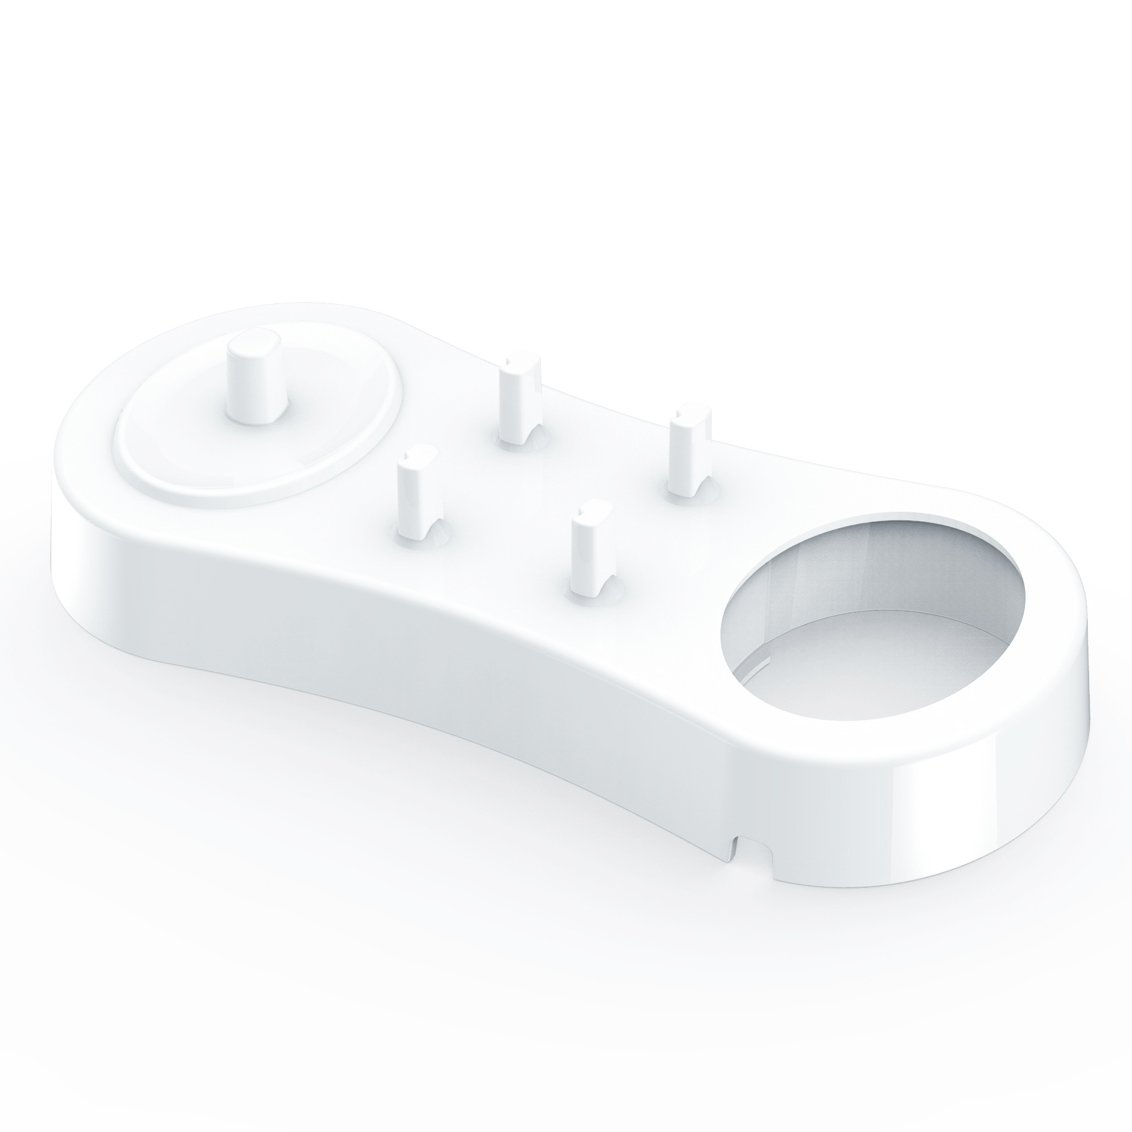 Titular de cepillo de dientes para cepillos de dientes eléctricos Oral-B  Poketech reposar durante 4 Cabezales de Cargador - Blanco 91148c53d511